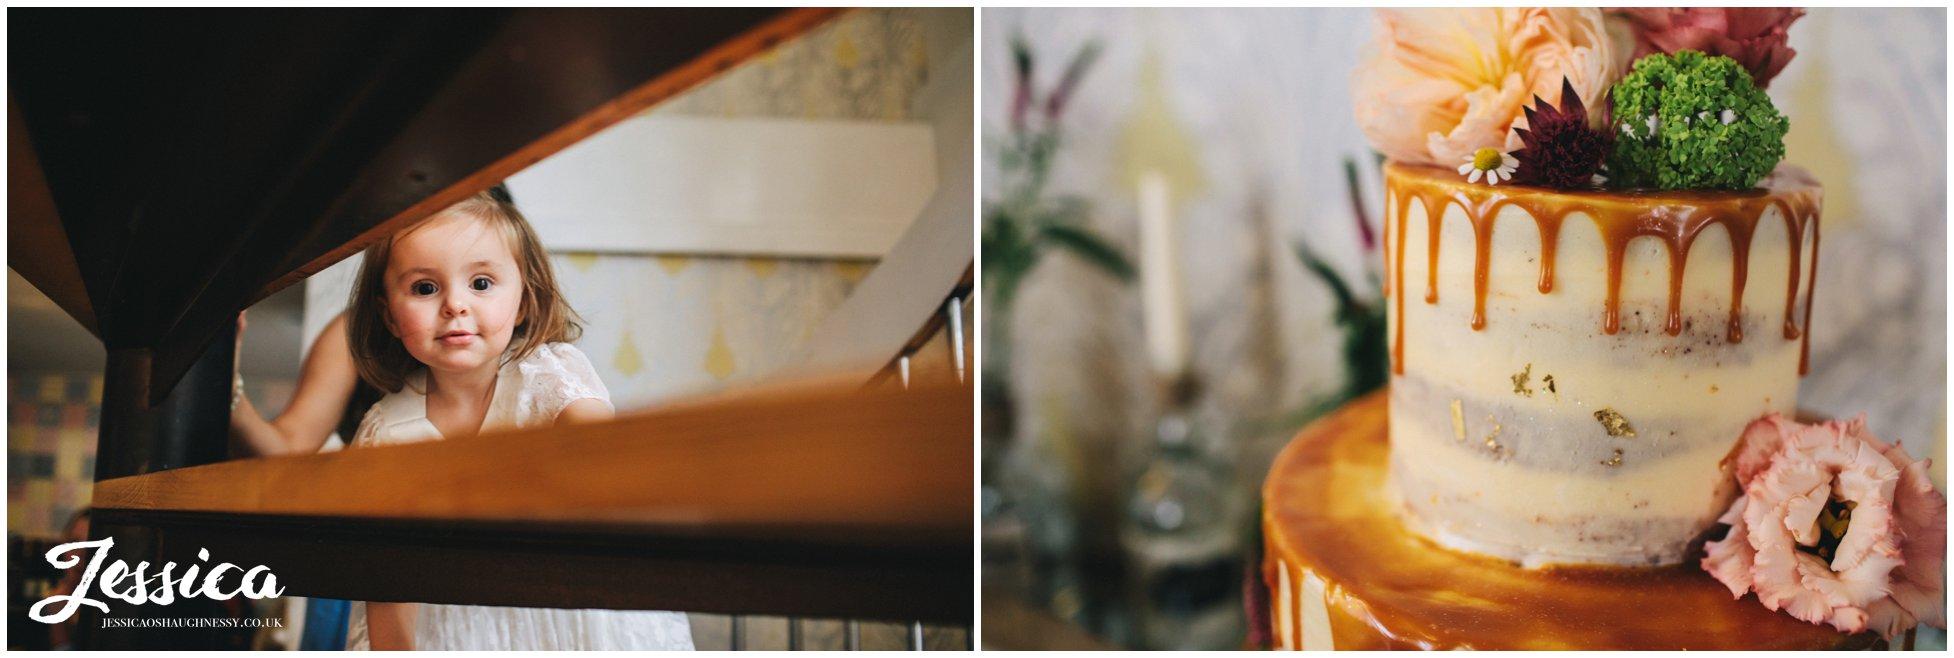 detail shot of quirky wedding cake